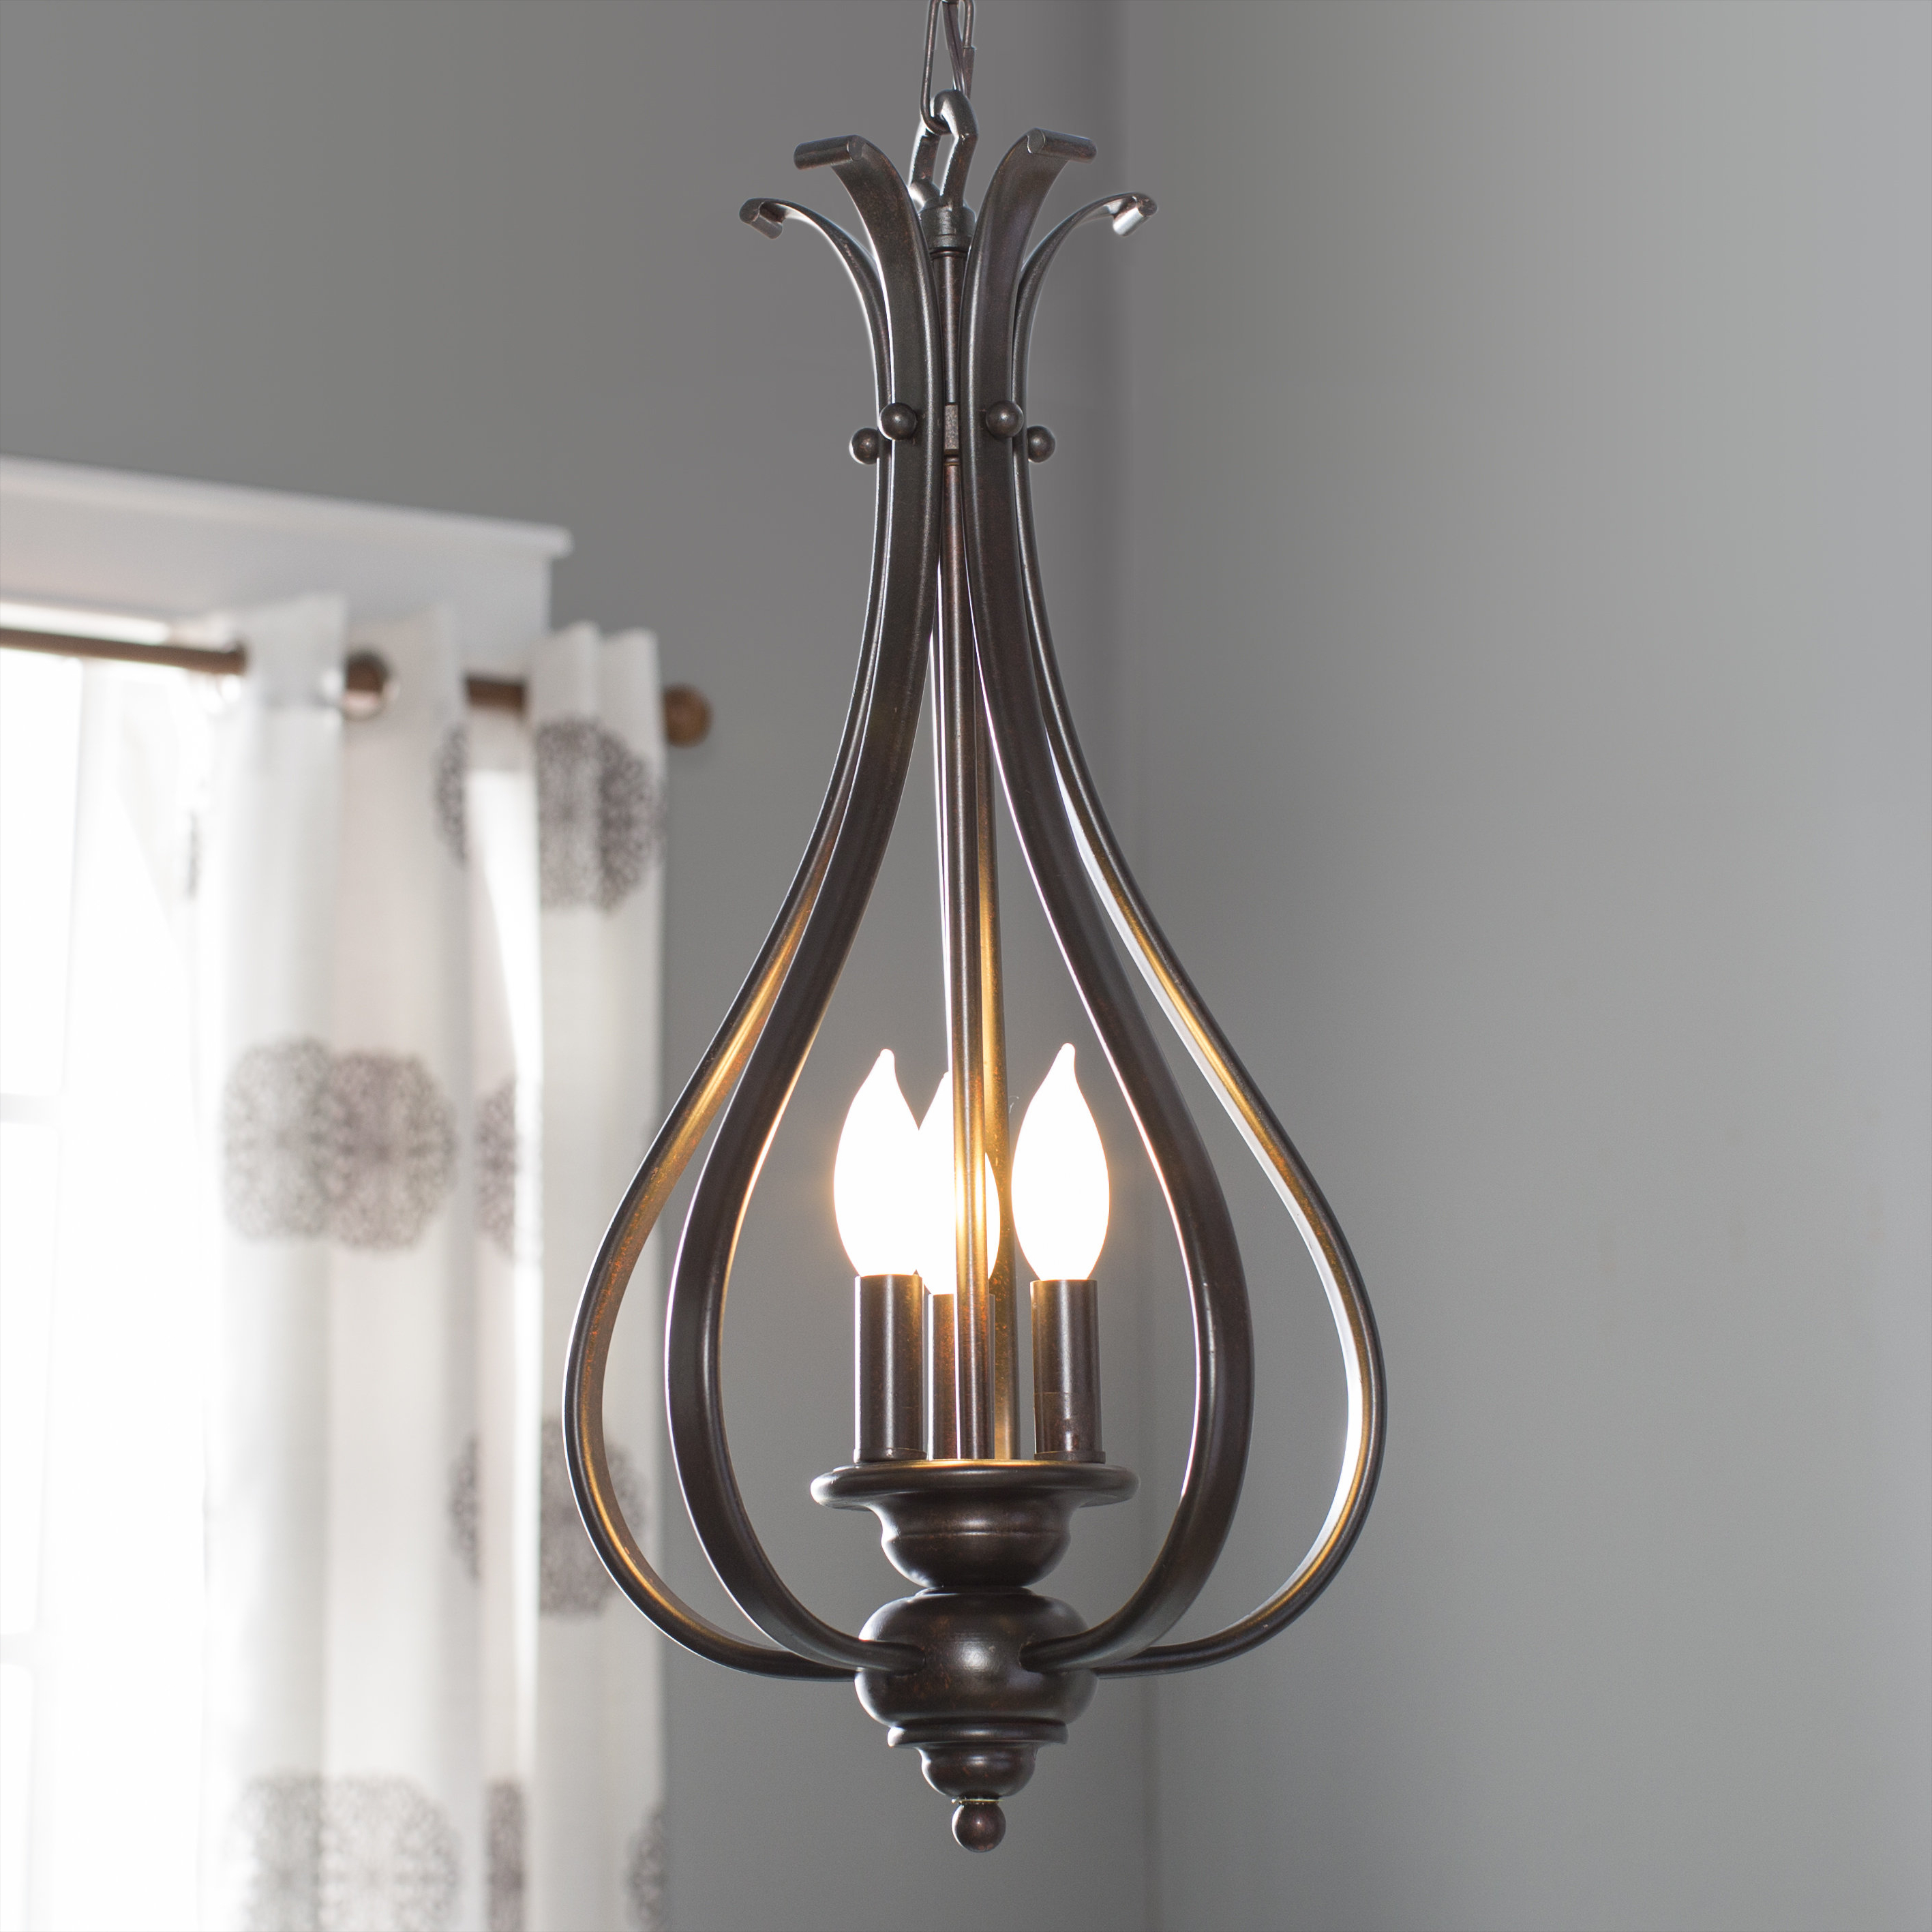 Van Horne 3-Light Single Teardrop Pendant pertaining to Widely used Warner Robins 3-Light Lantern Pendants